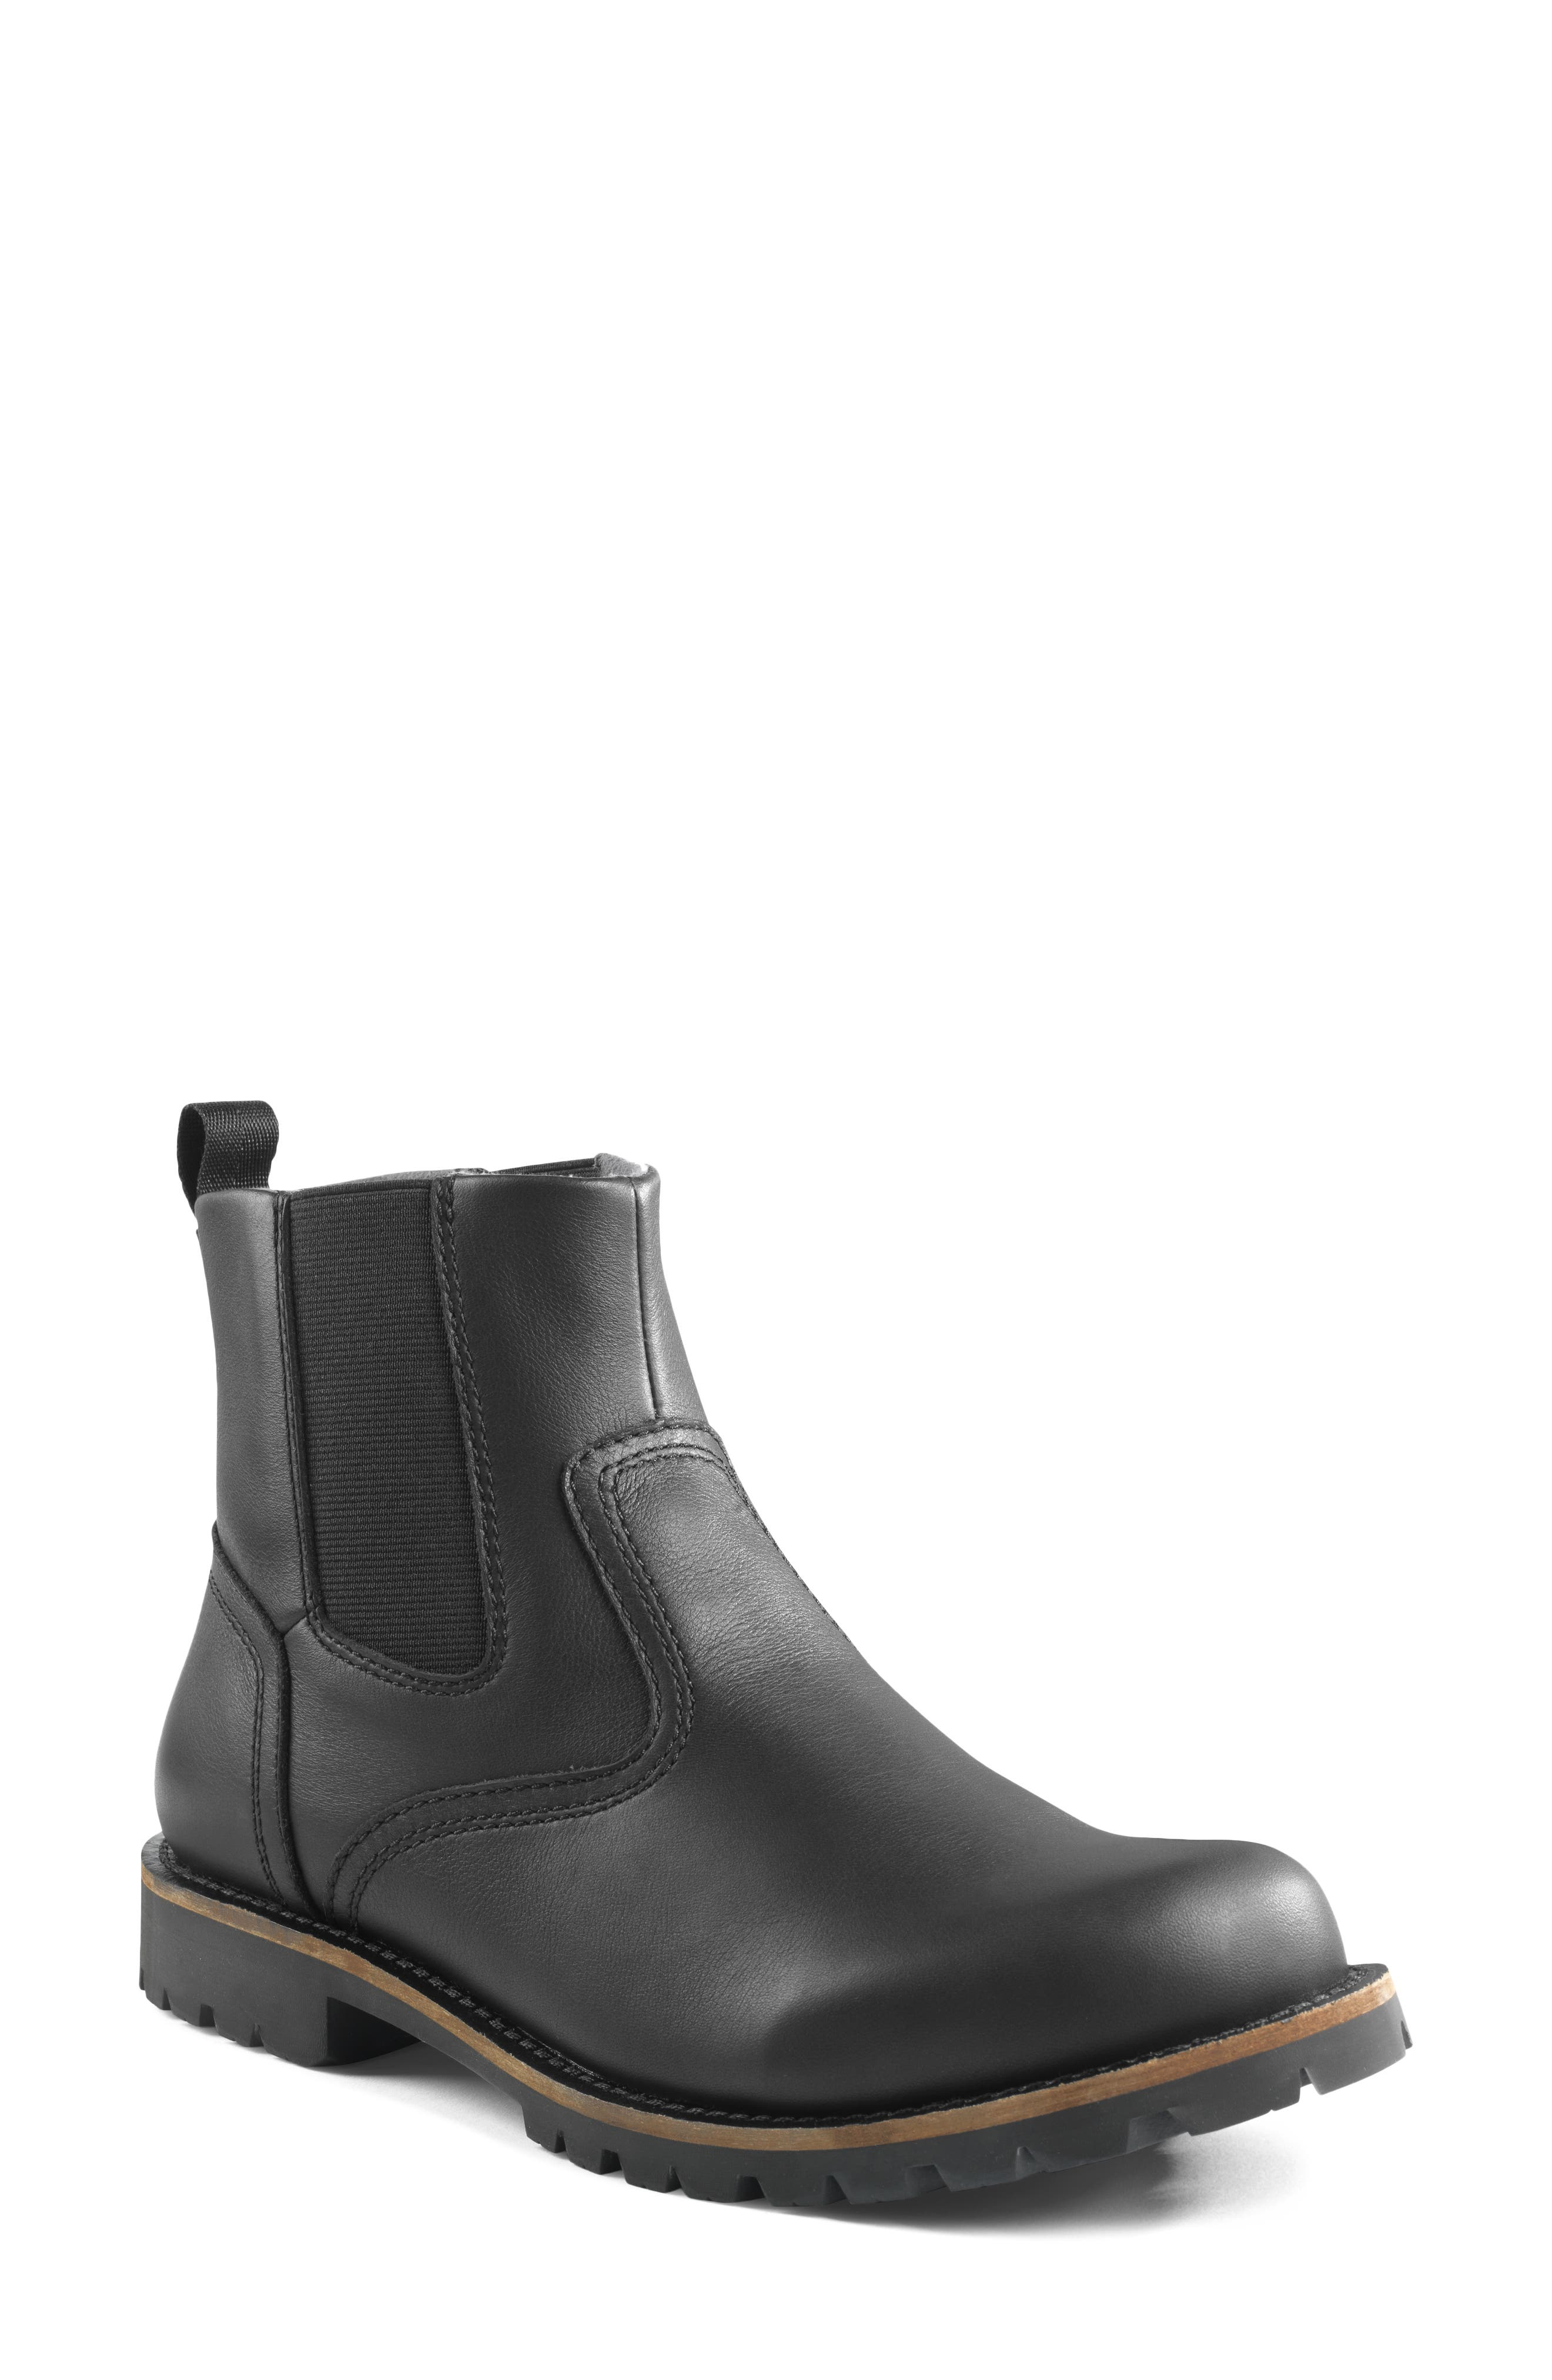 Bruce Waterproof Chelsea Boot